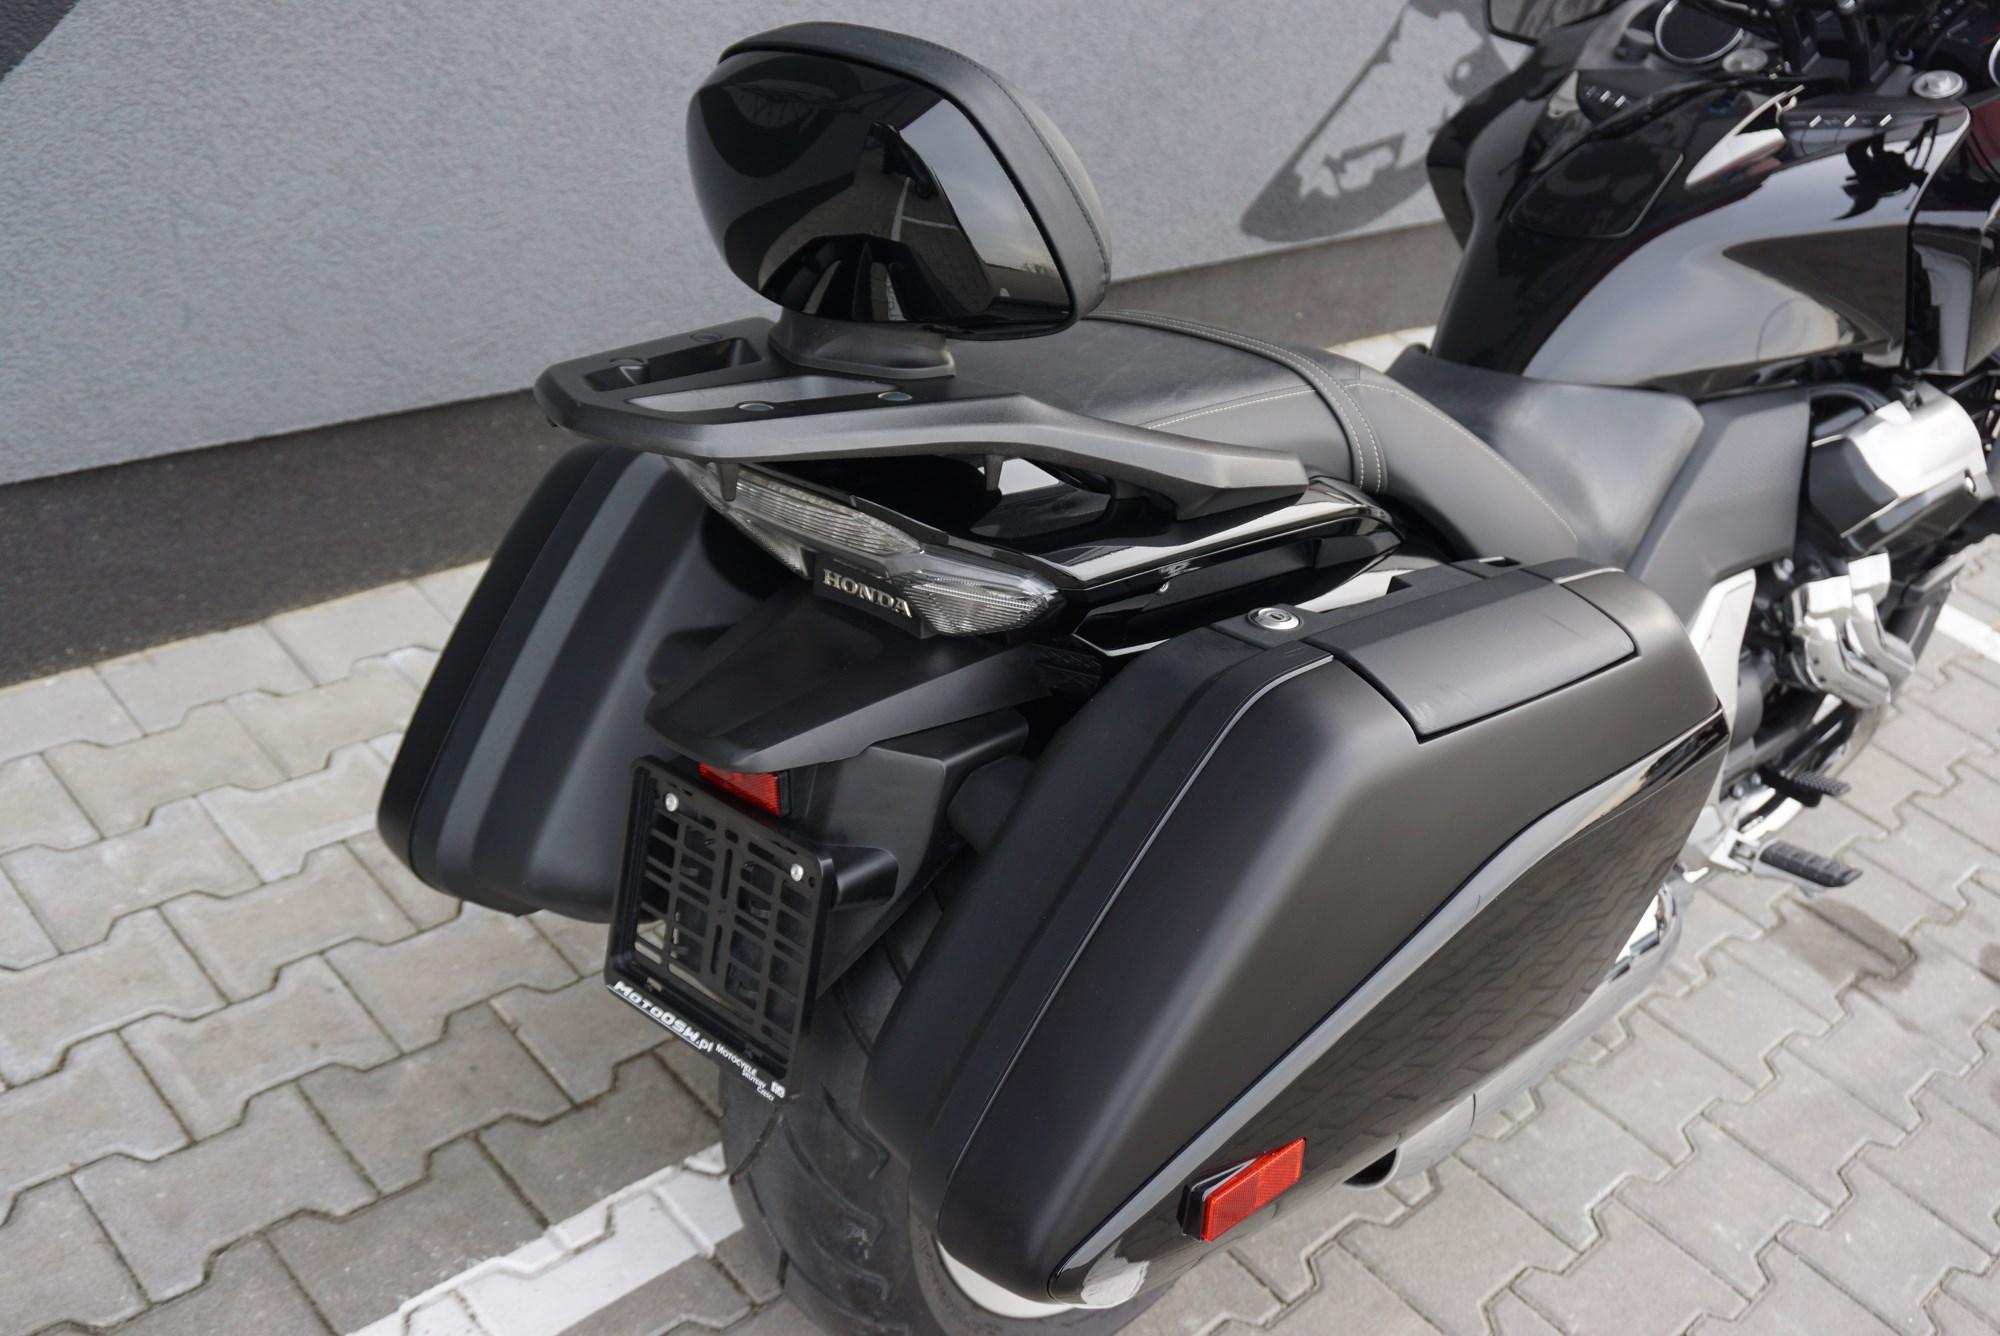 Honda CTX 1300 ABS